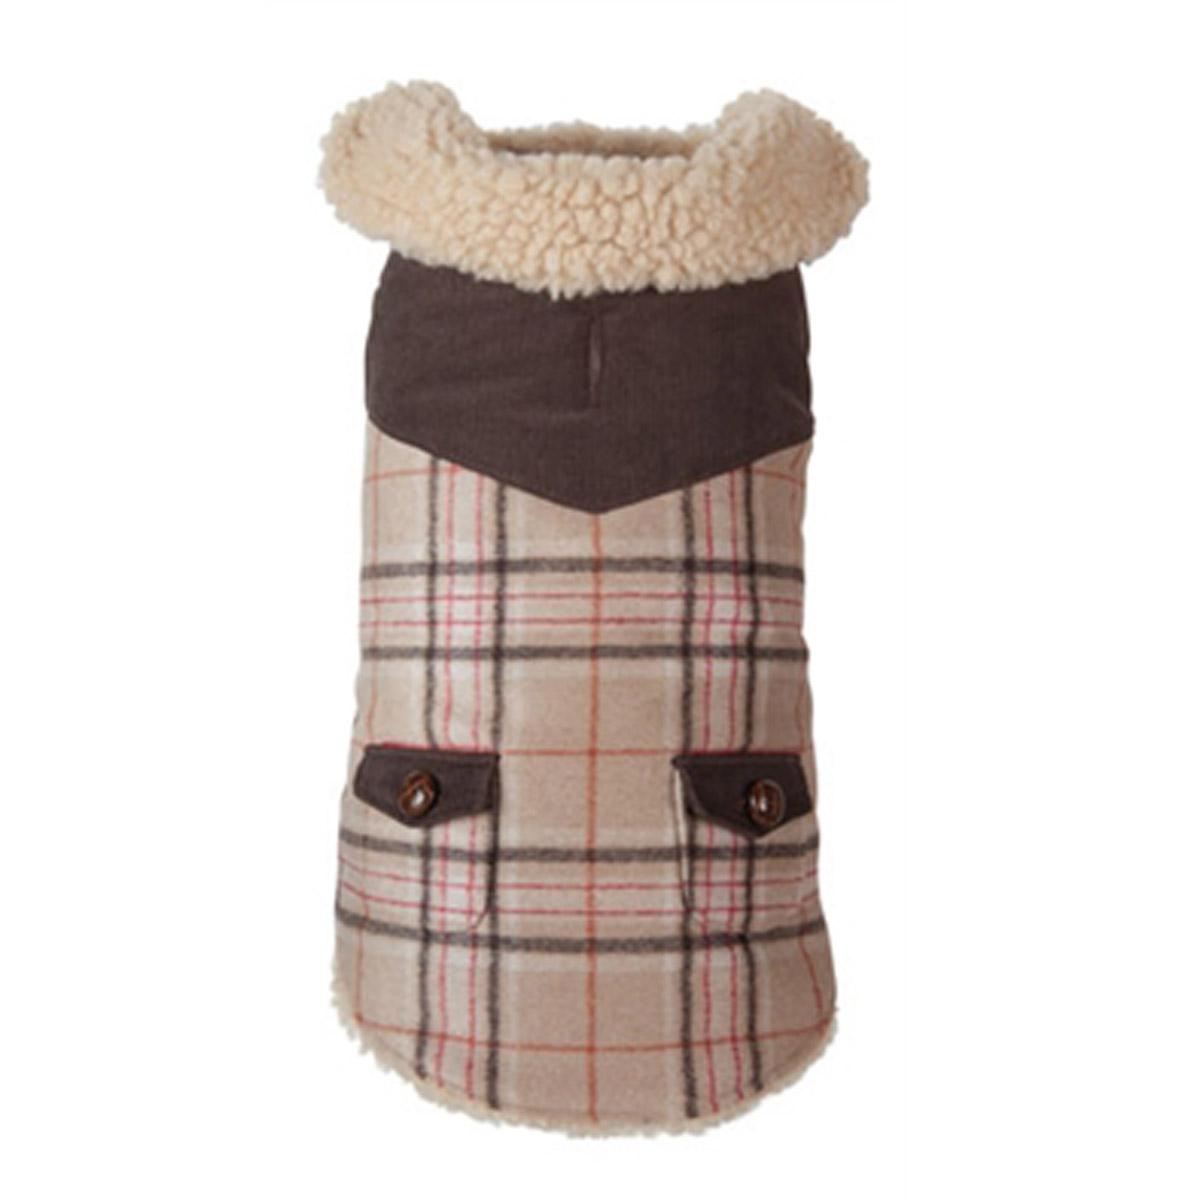 Wool Plaid Shearling Dog Jacket - Camel